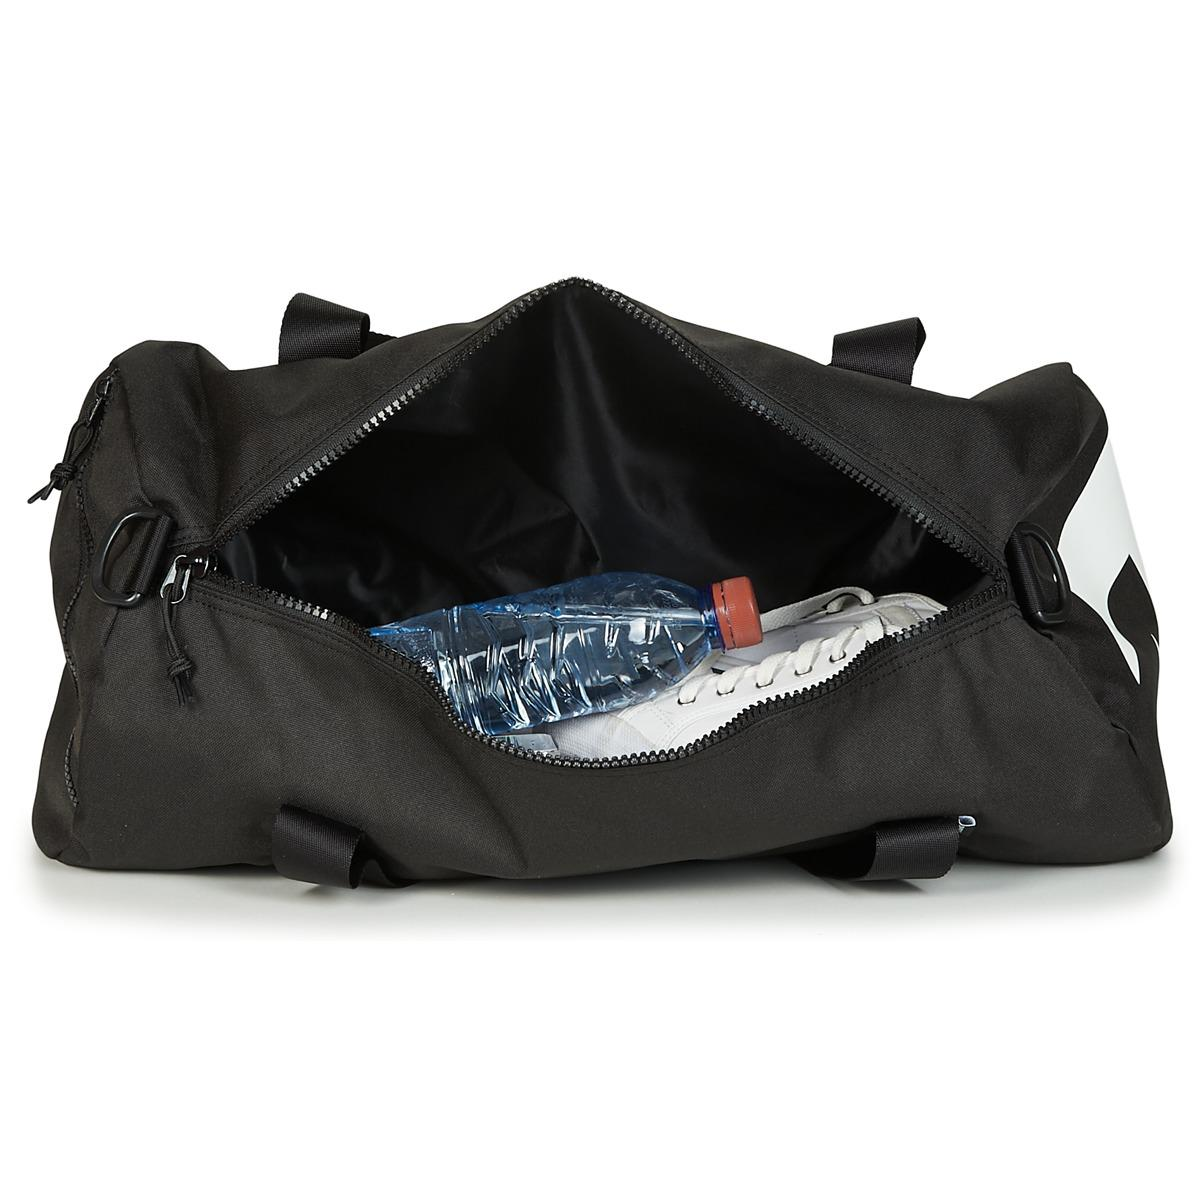 87b083a3138 Converse Sport Duffel Large Men s Sports Bag In Black in Black for ...